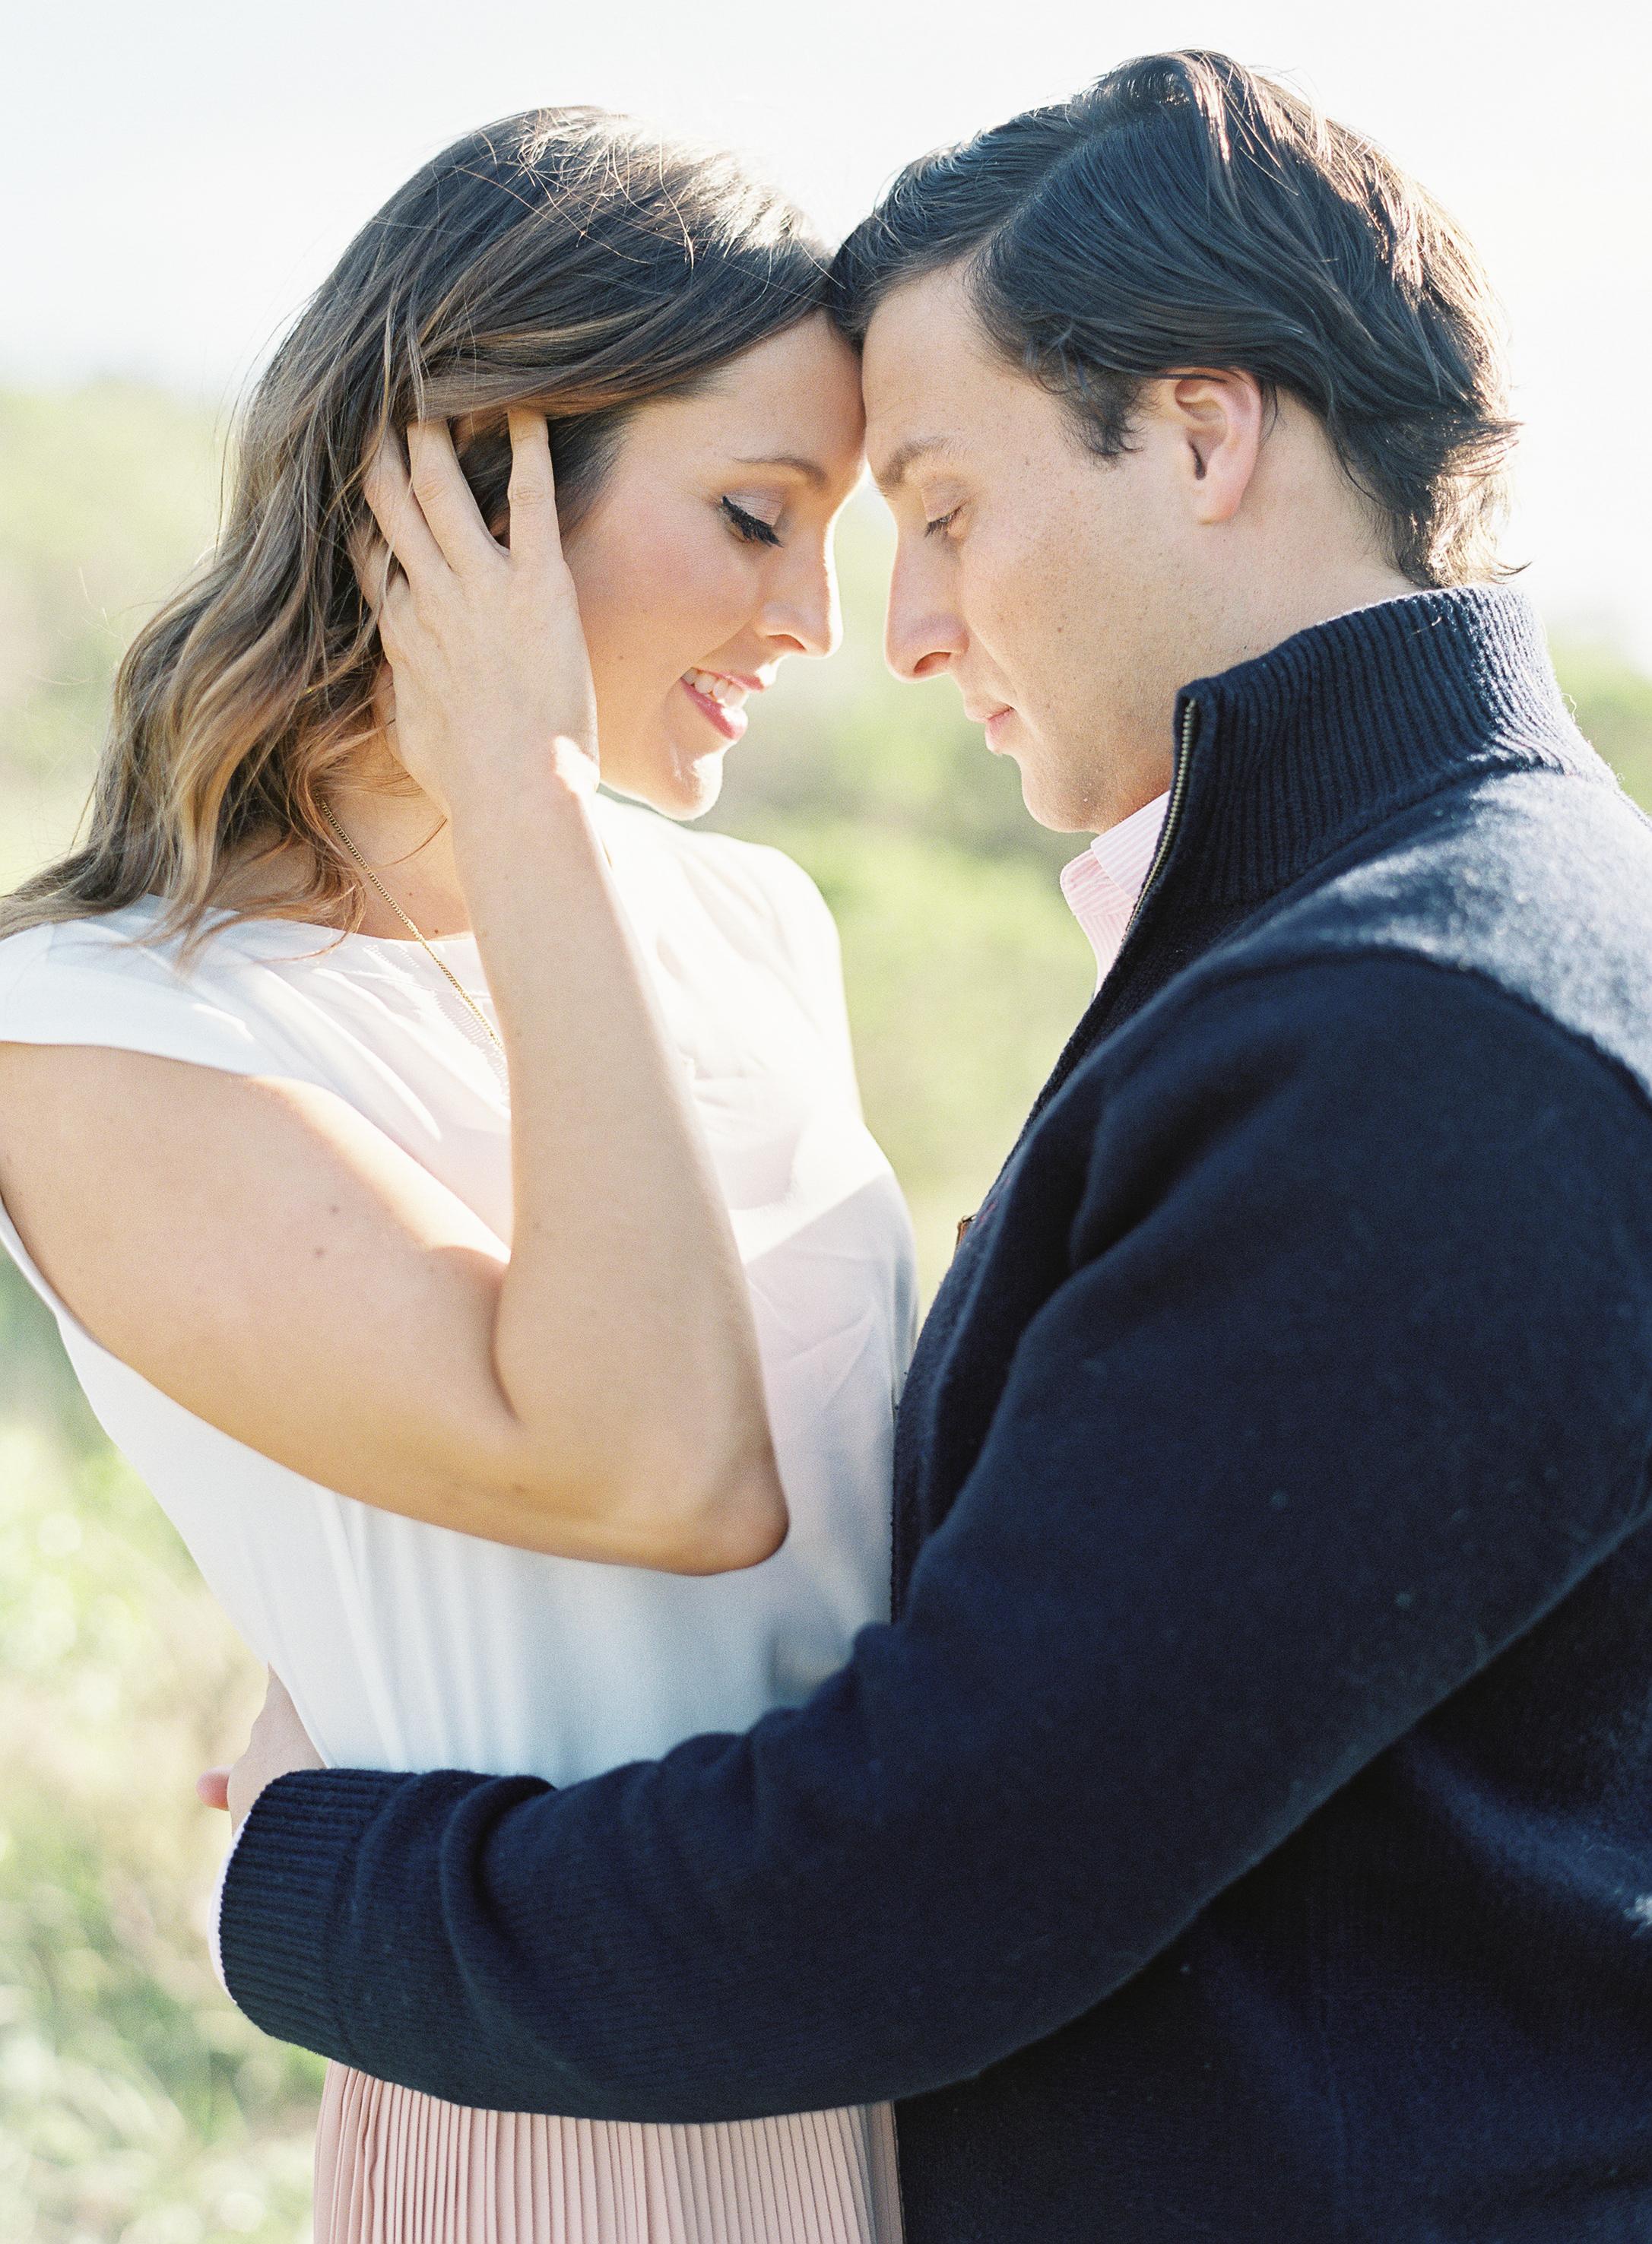 Meghan Mehan Photography - Fine Art Film Wedding Photography - San Francisco   Napa   Sonoma   Big Sur   Chicago   Minneapolis   Milwaukee   Lake Geneva   Door County   Wisconsin 021.jpg